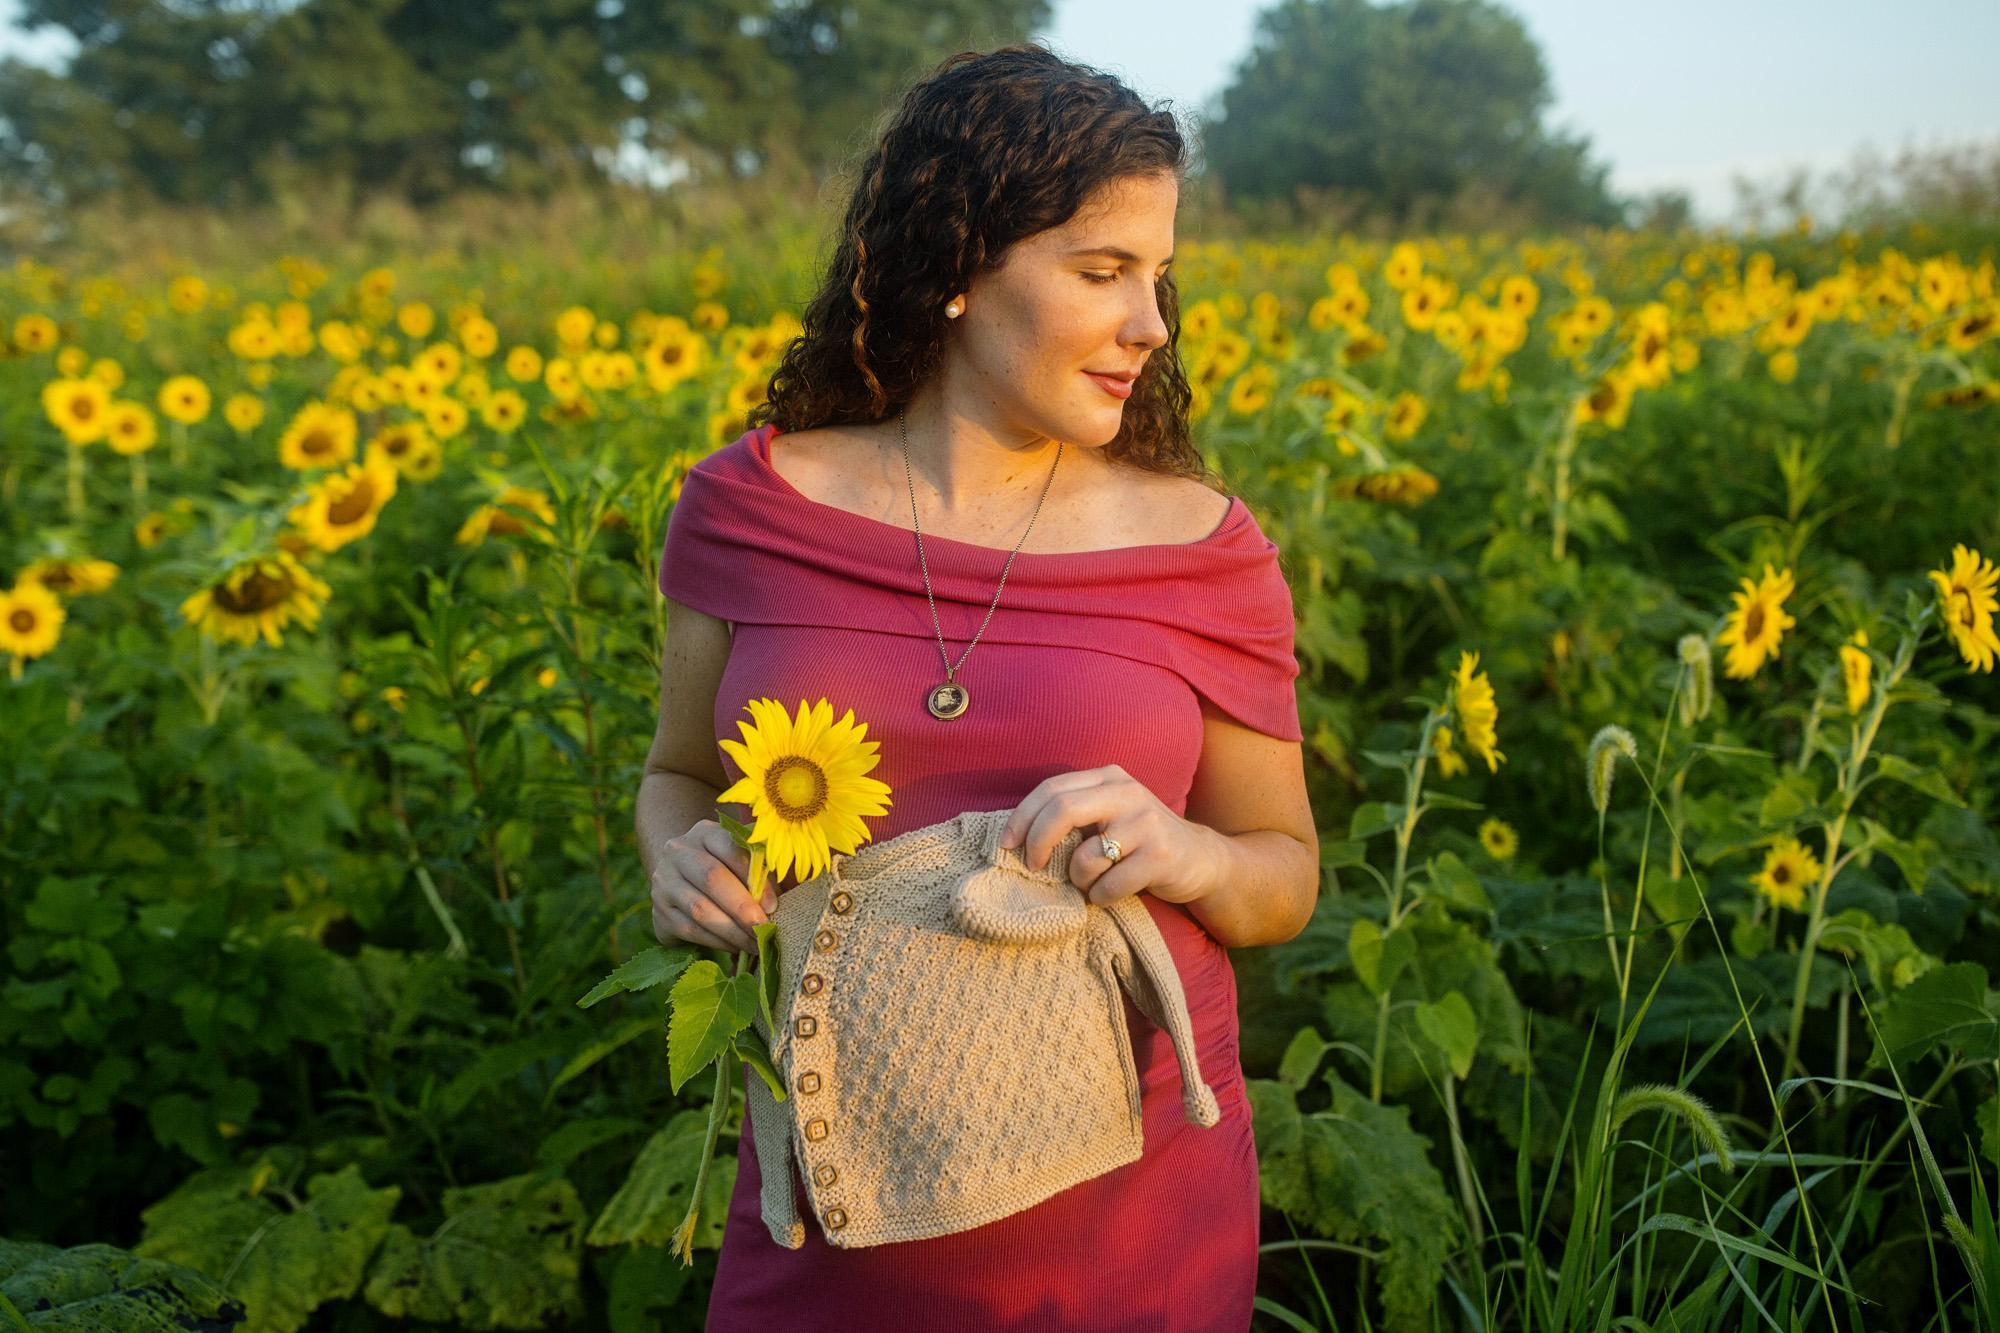 Seriously_Sabrina_Photography_Lexington_Frankfort_Kentucky_Maternity_Mini_Sunflowers_Johns16.jpg